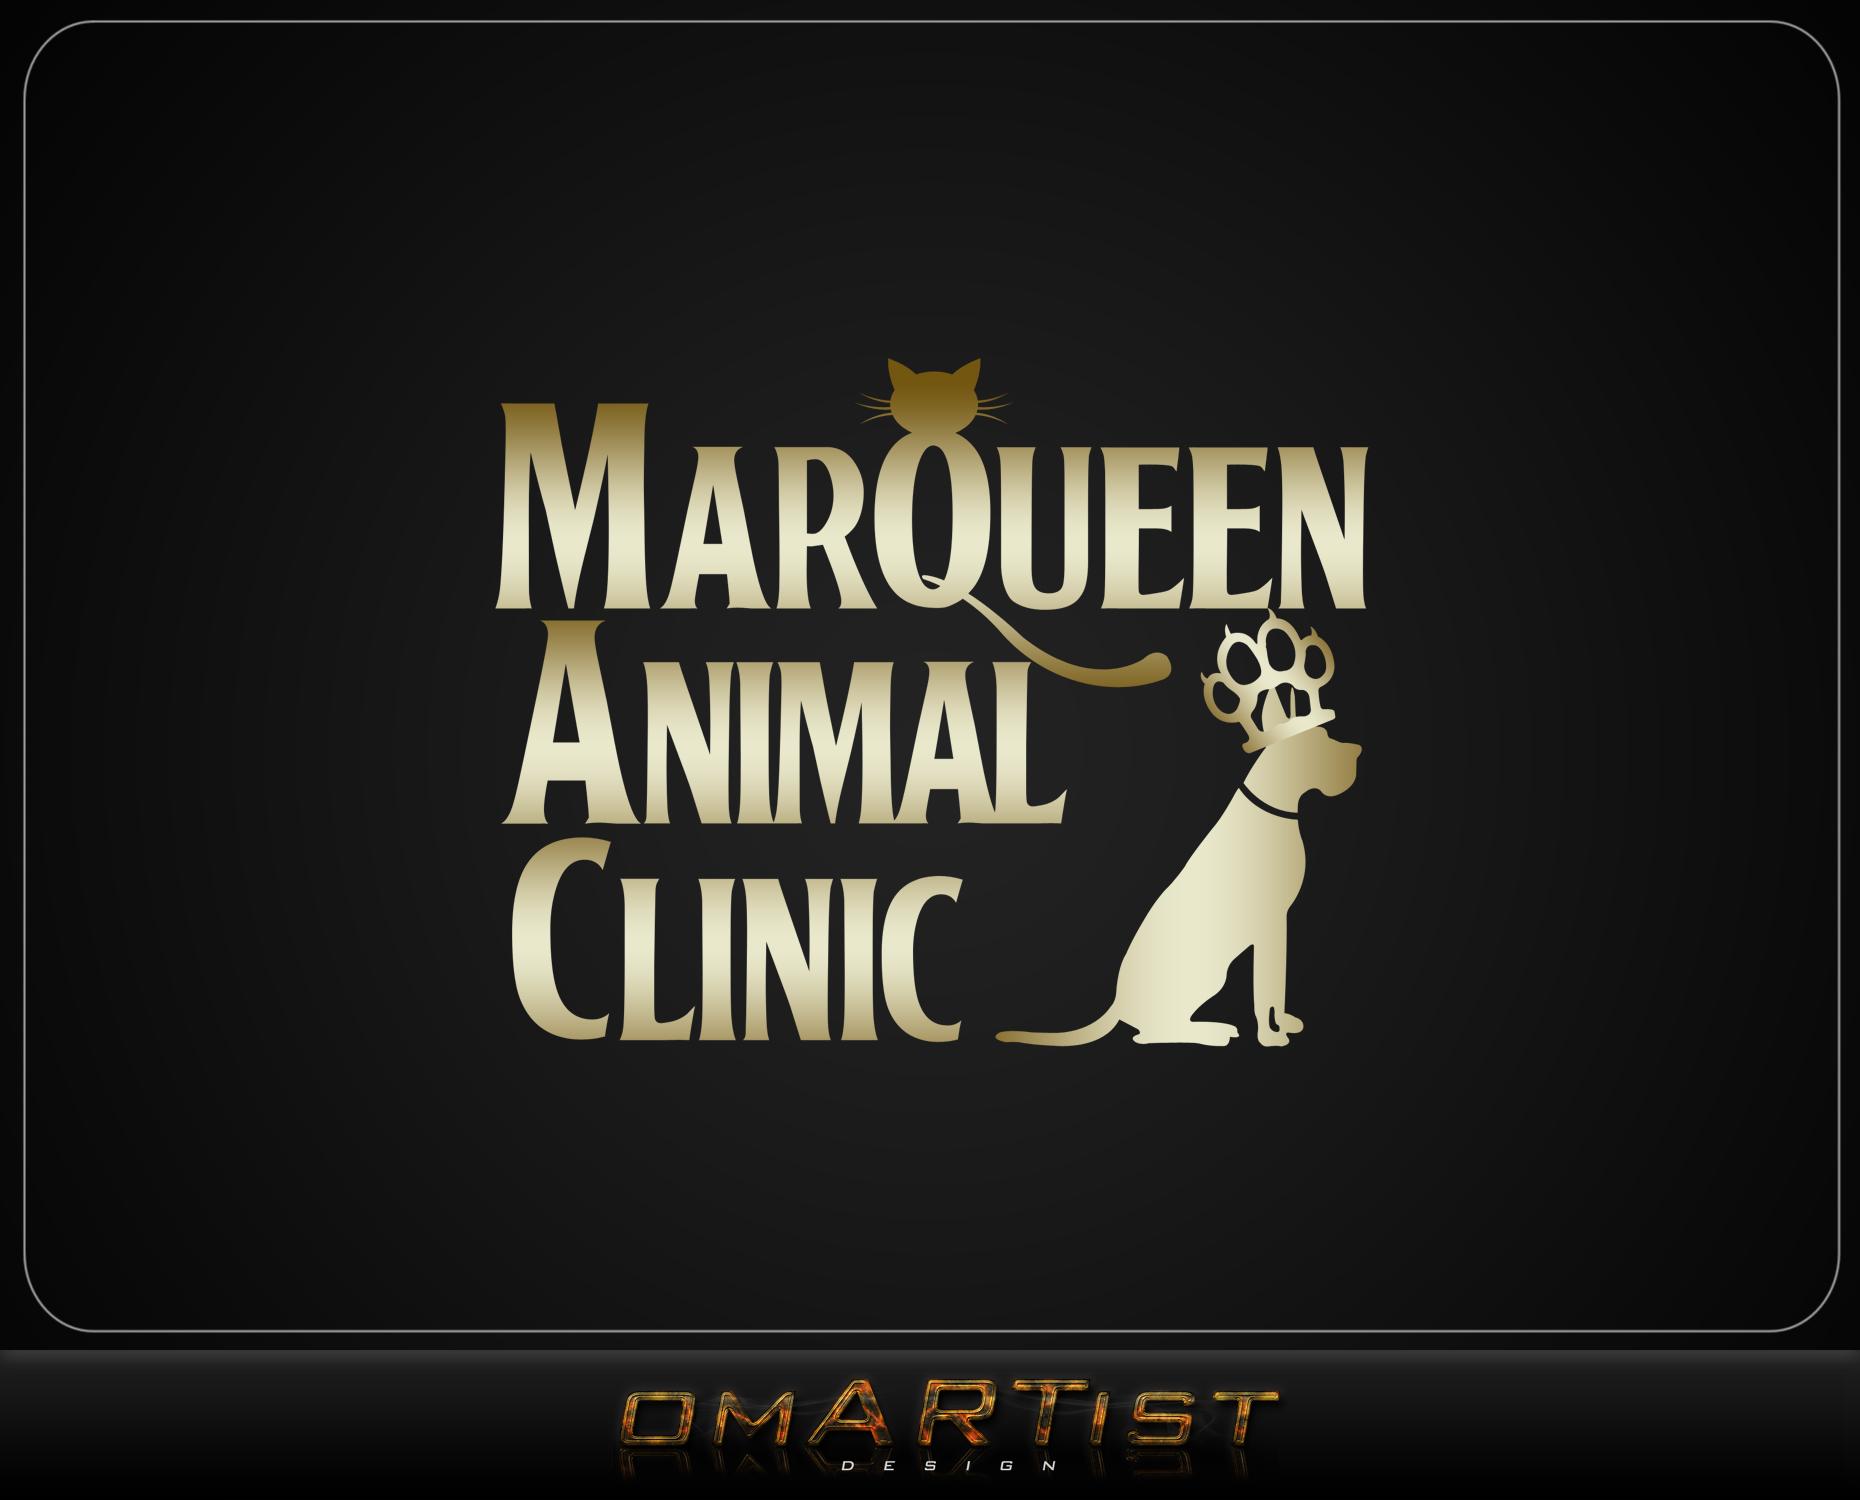 Logo Design by omARTist - Entry No. 14 in the Logo Design Contest Fun Logo Design for MarQueen Animal Clinic.